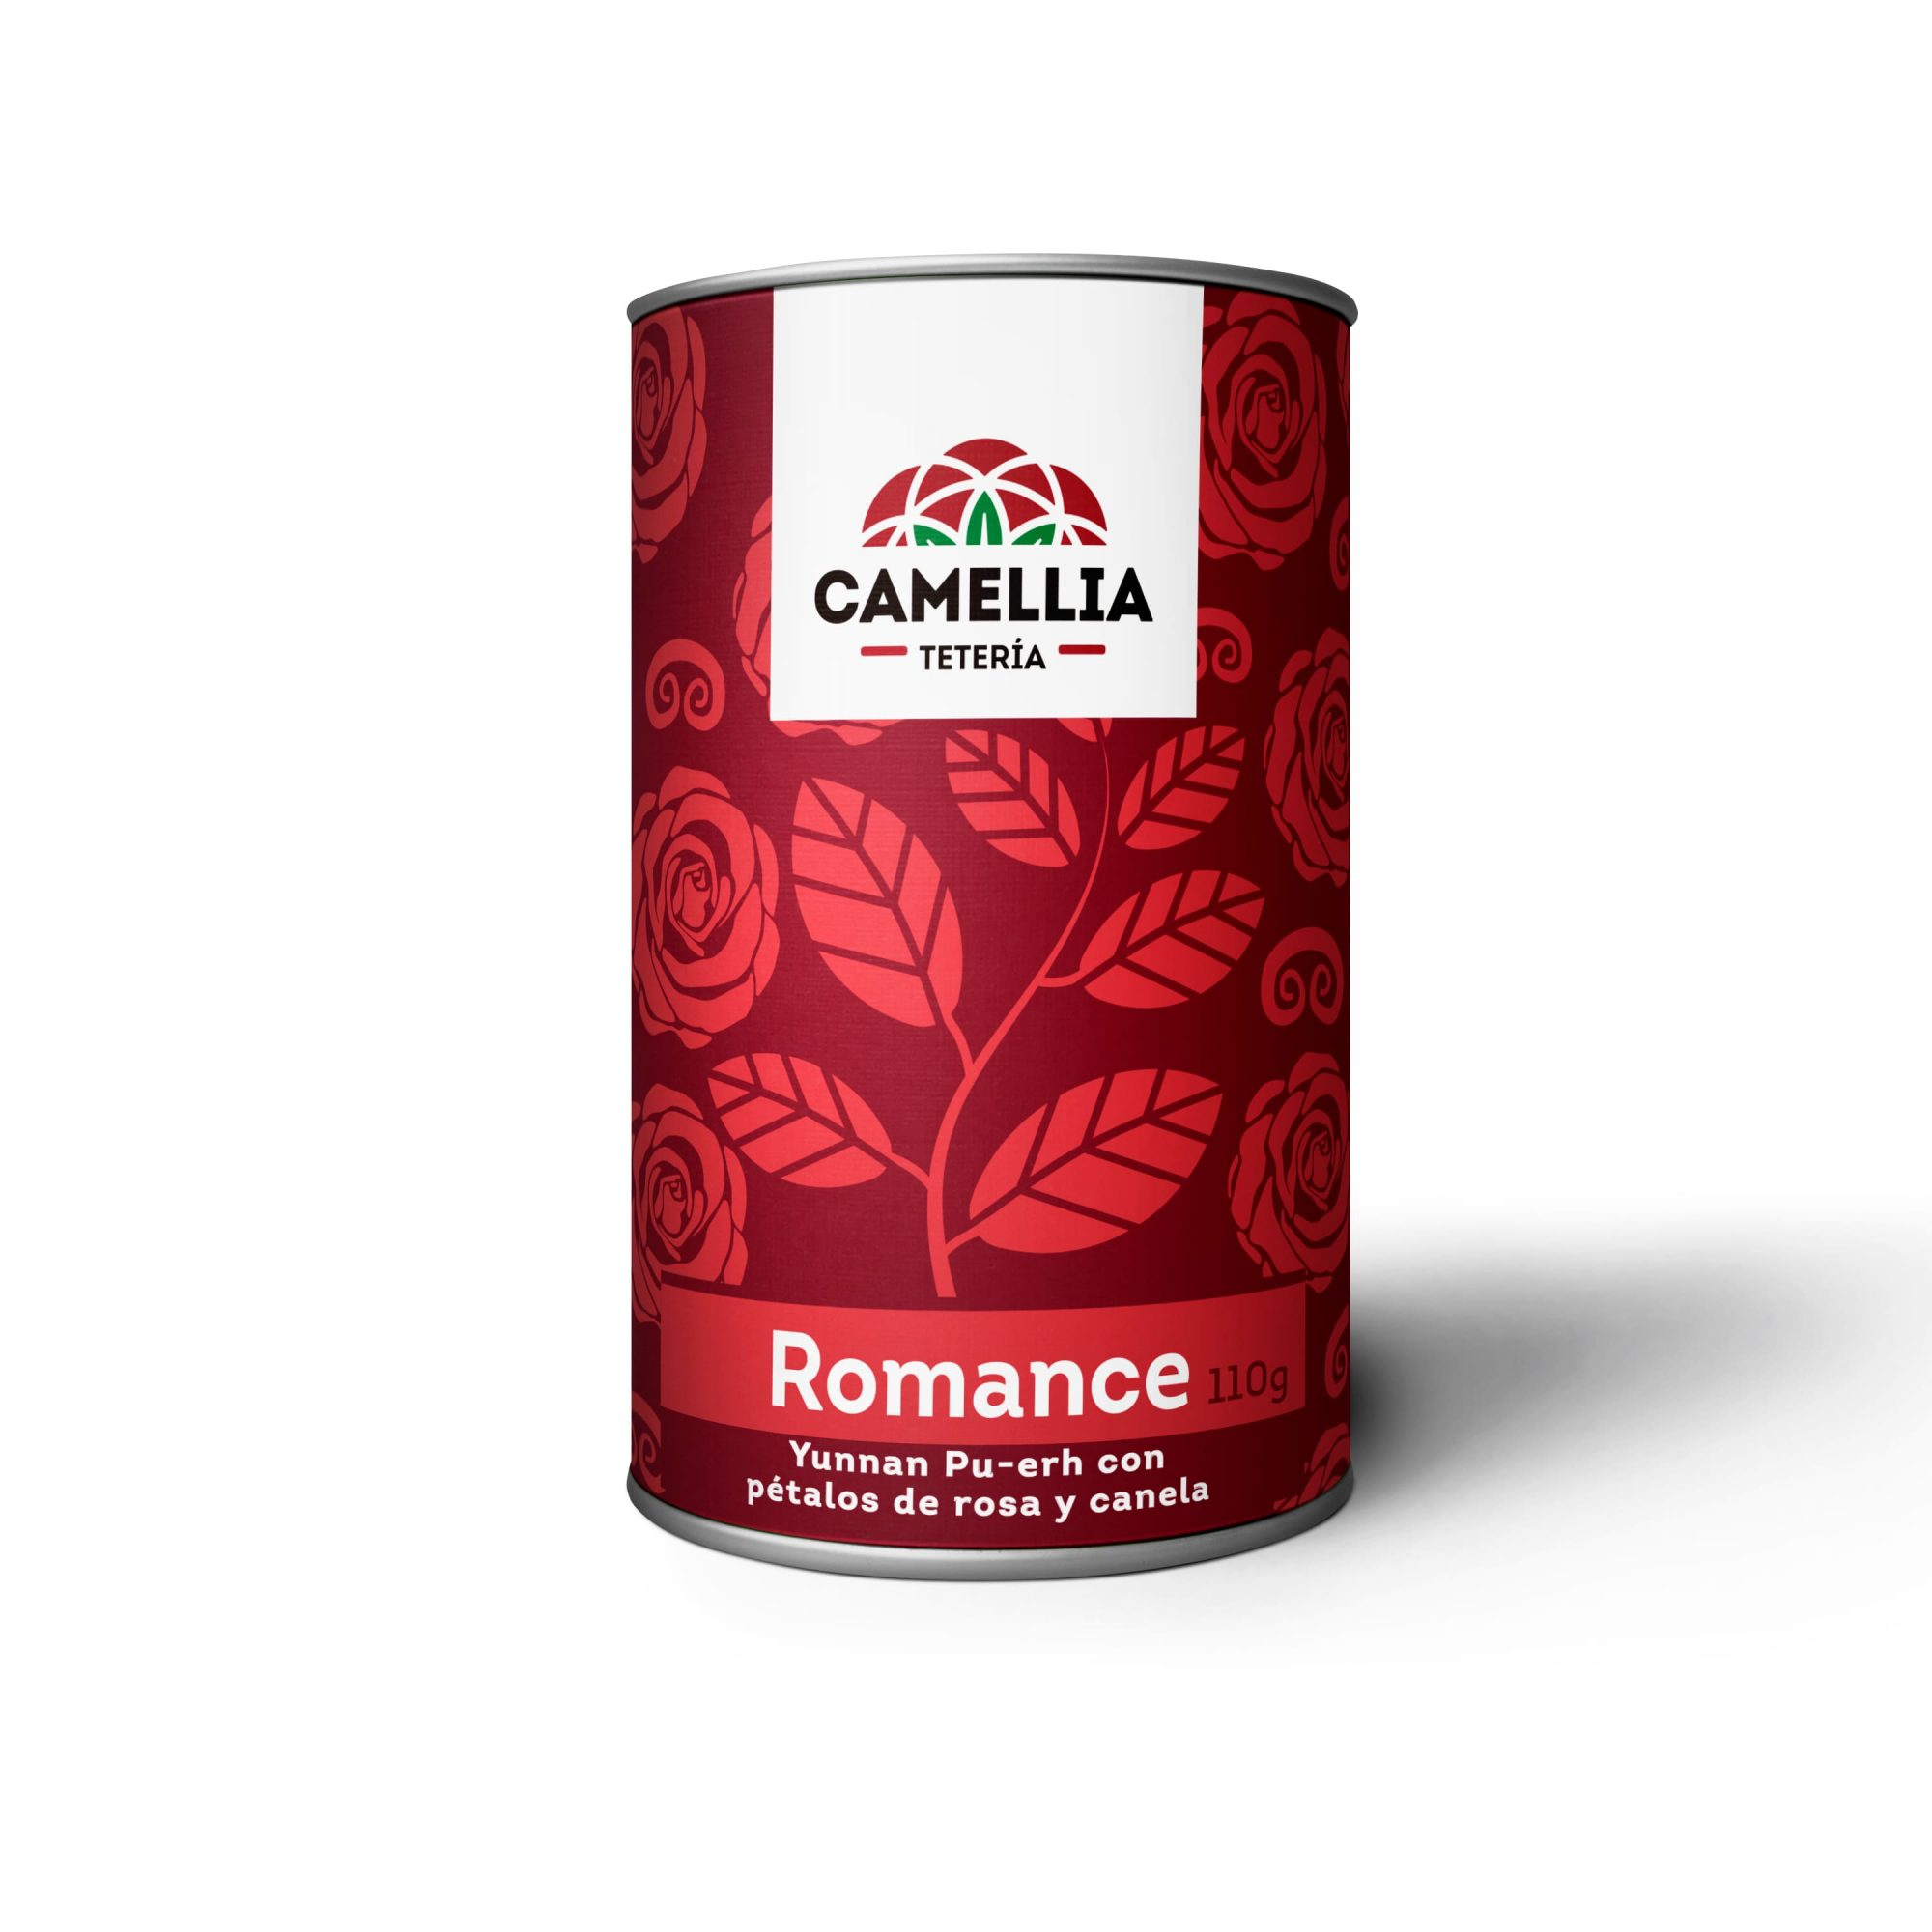 romance té rojo pu-erh yunnan petalos de rosa y canela